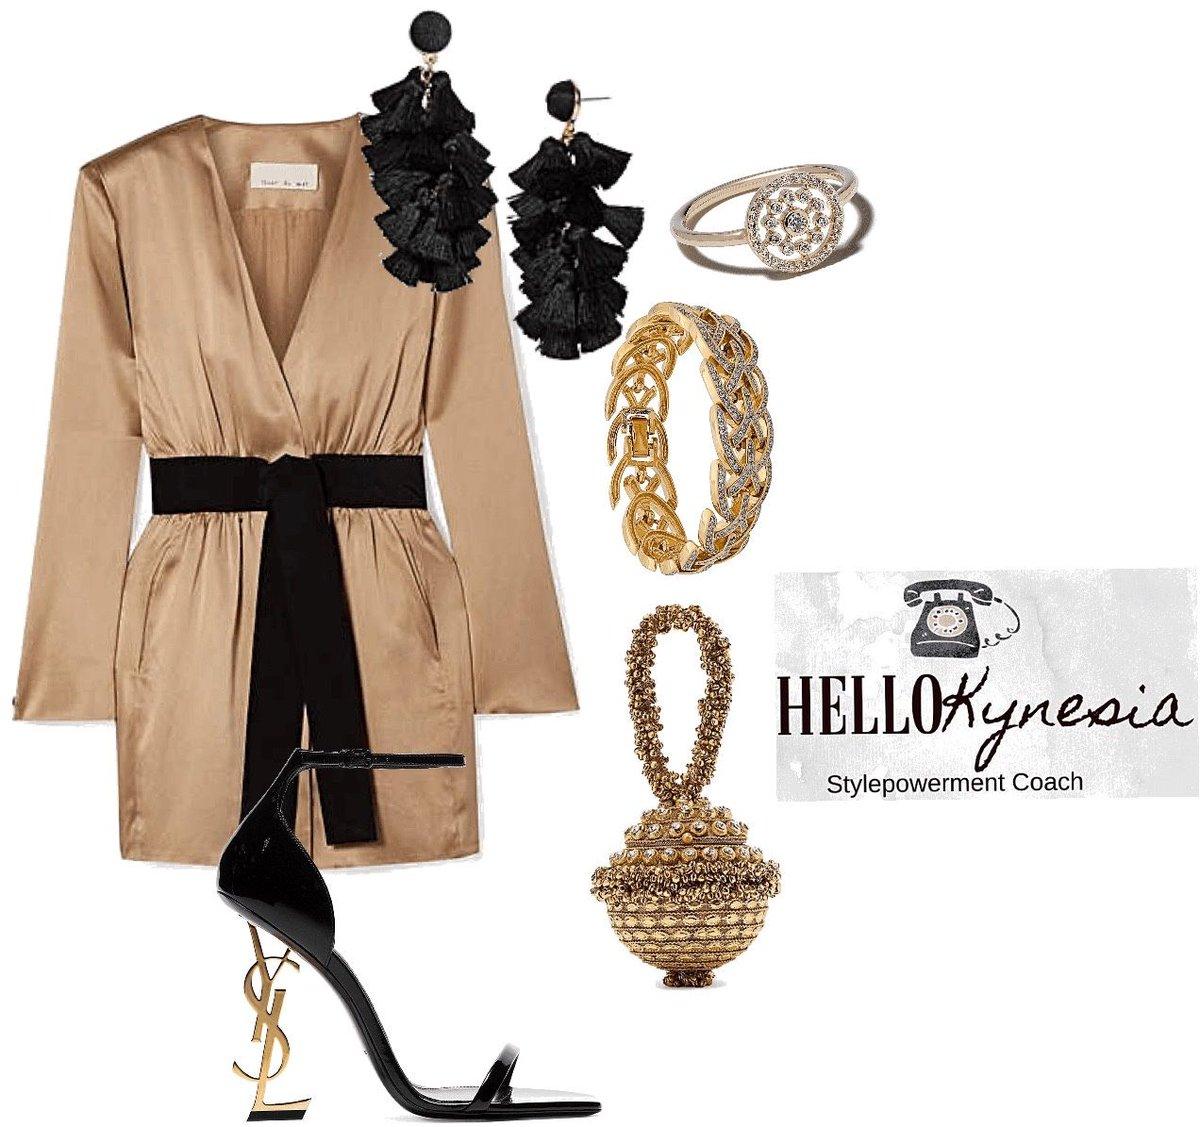 Styling by http://HelloKynesia.com #womenfashion #style #womenstyle #womenstyleguide #fashiongasmsapproved #fashiongasmsboutique #fashion #casual #stylist #atlantastylist #imagecoaching #ootd #fashionista #bestoftheday #glam #styleconsultant #hellokynesia #stylebloggerpic.twitter.com/2oxoV920Fj